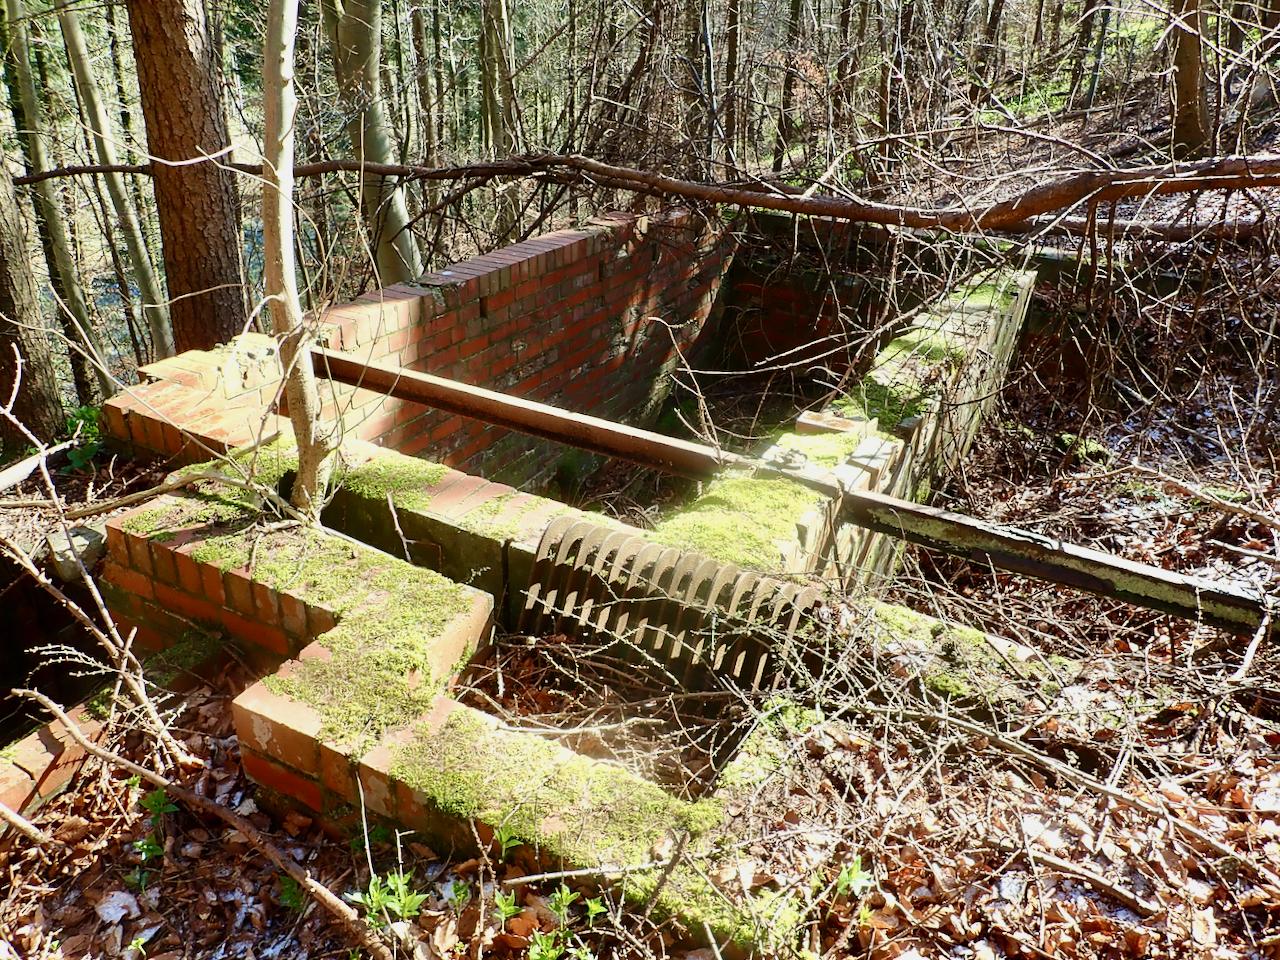 Sewage treatment tank?